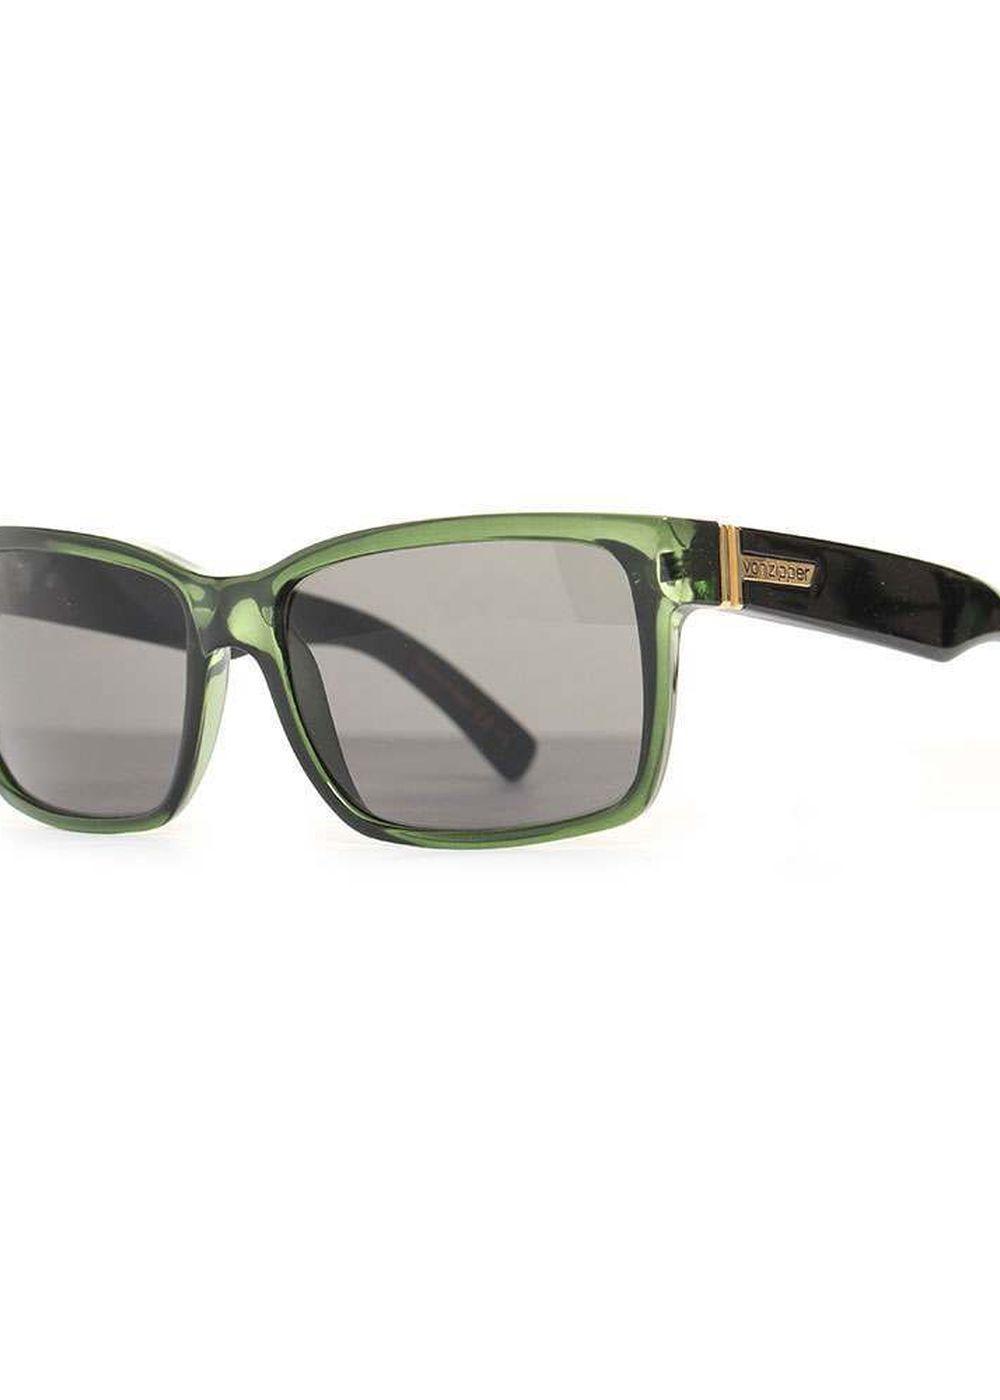 vonzipper-elmore-sunglasses-bottle-greennew-grey